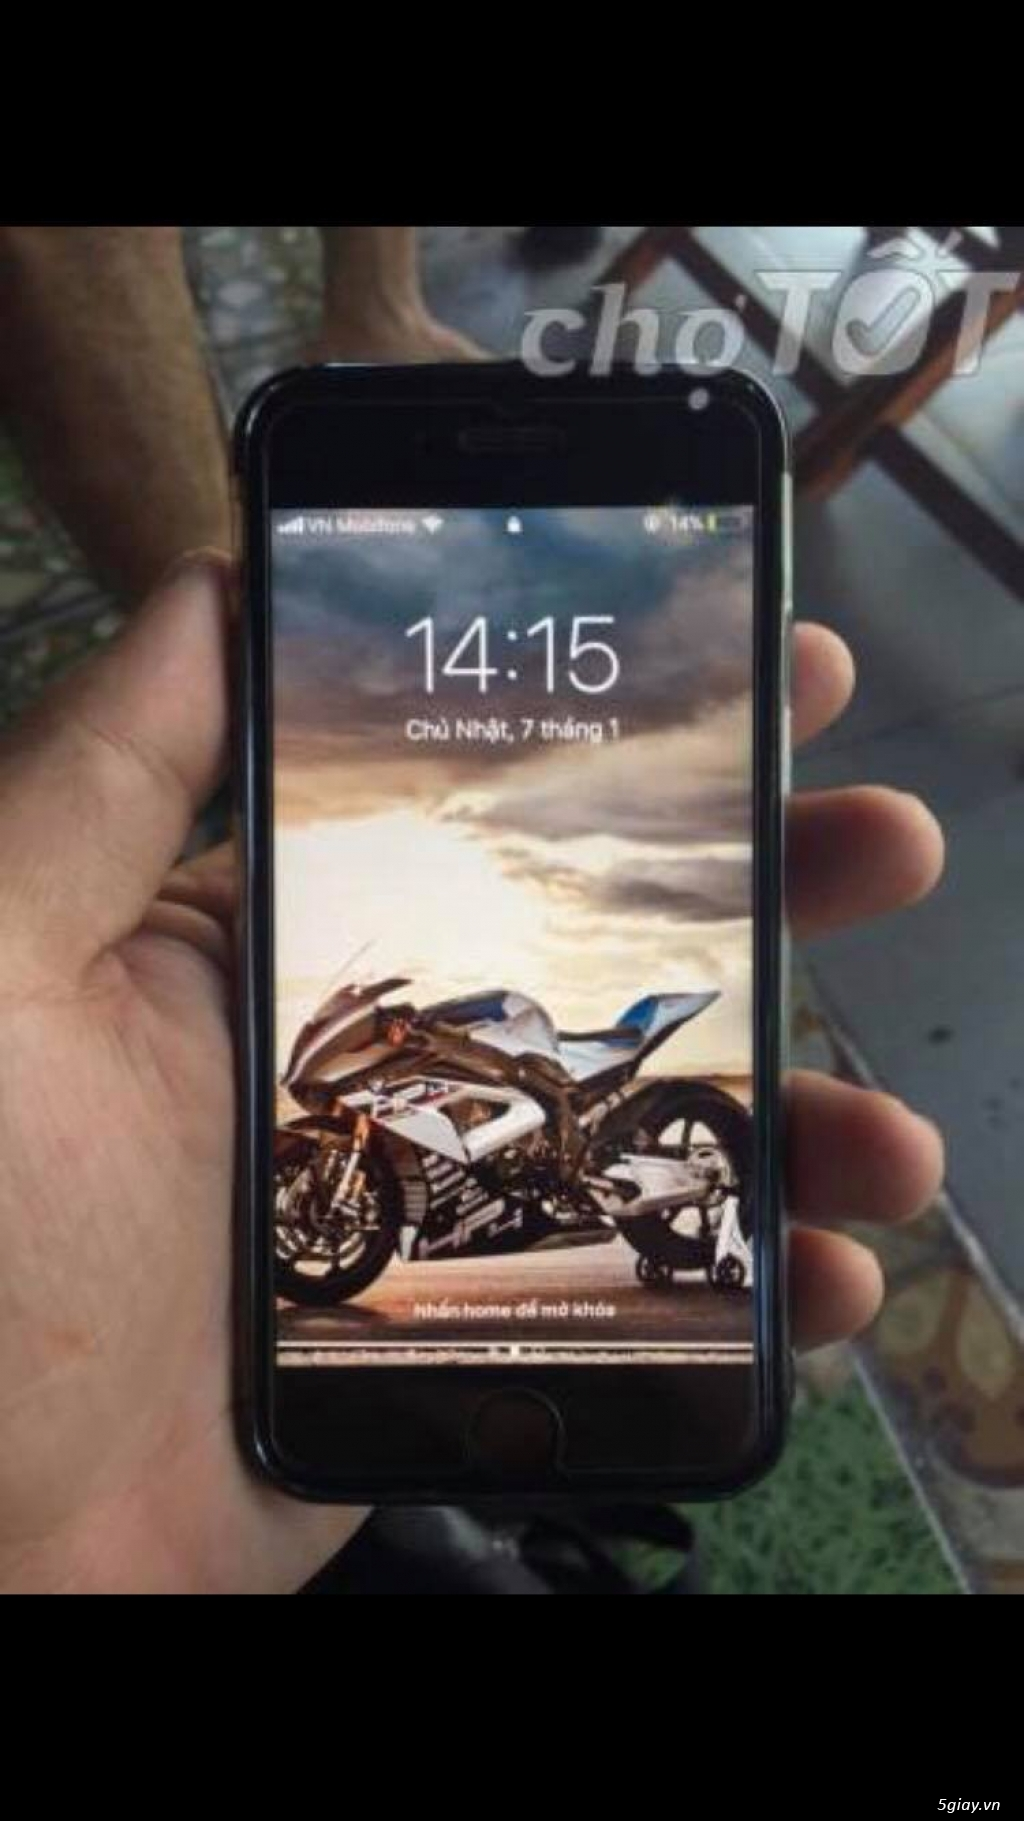 apple watch series 1 giá bèo, ip 7 lock, ip 6 plus 128gb - 13